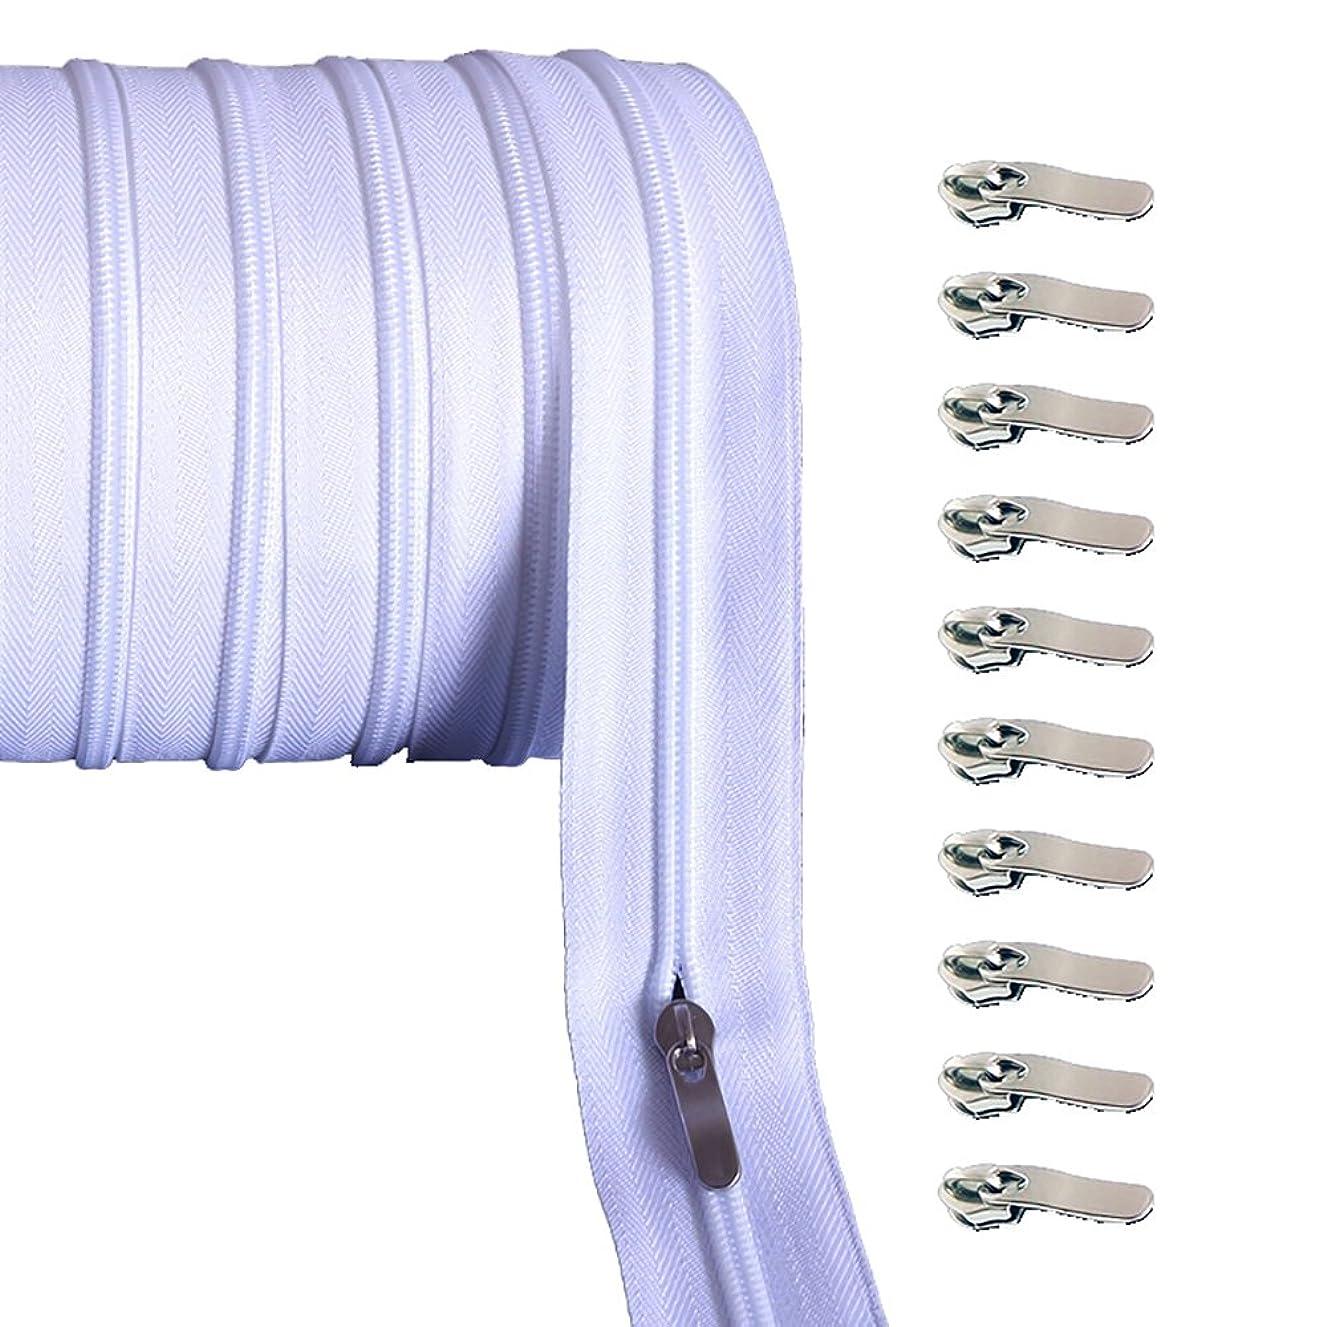 BCQLI No.3 33 feet Long 1.18 inches Wide White Nylon Zipper,10 Zipper Head